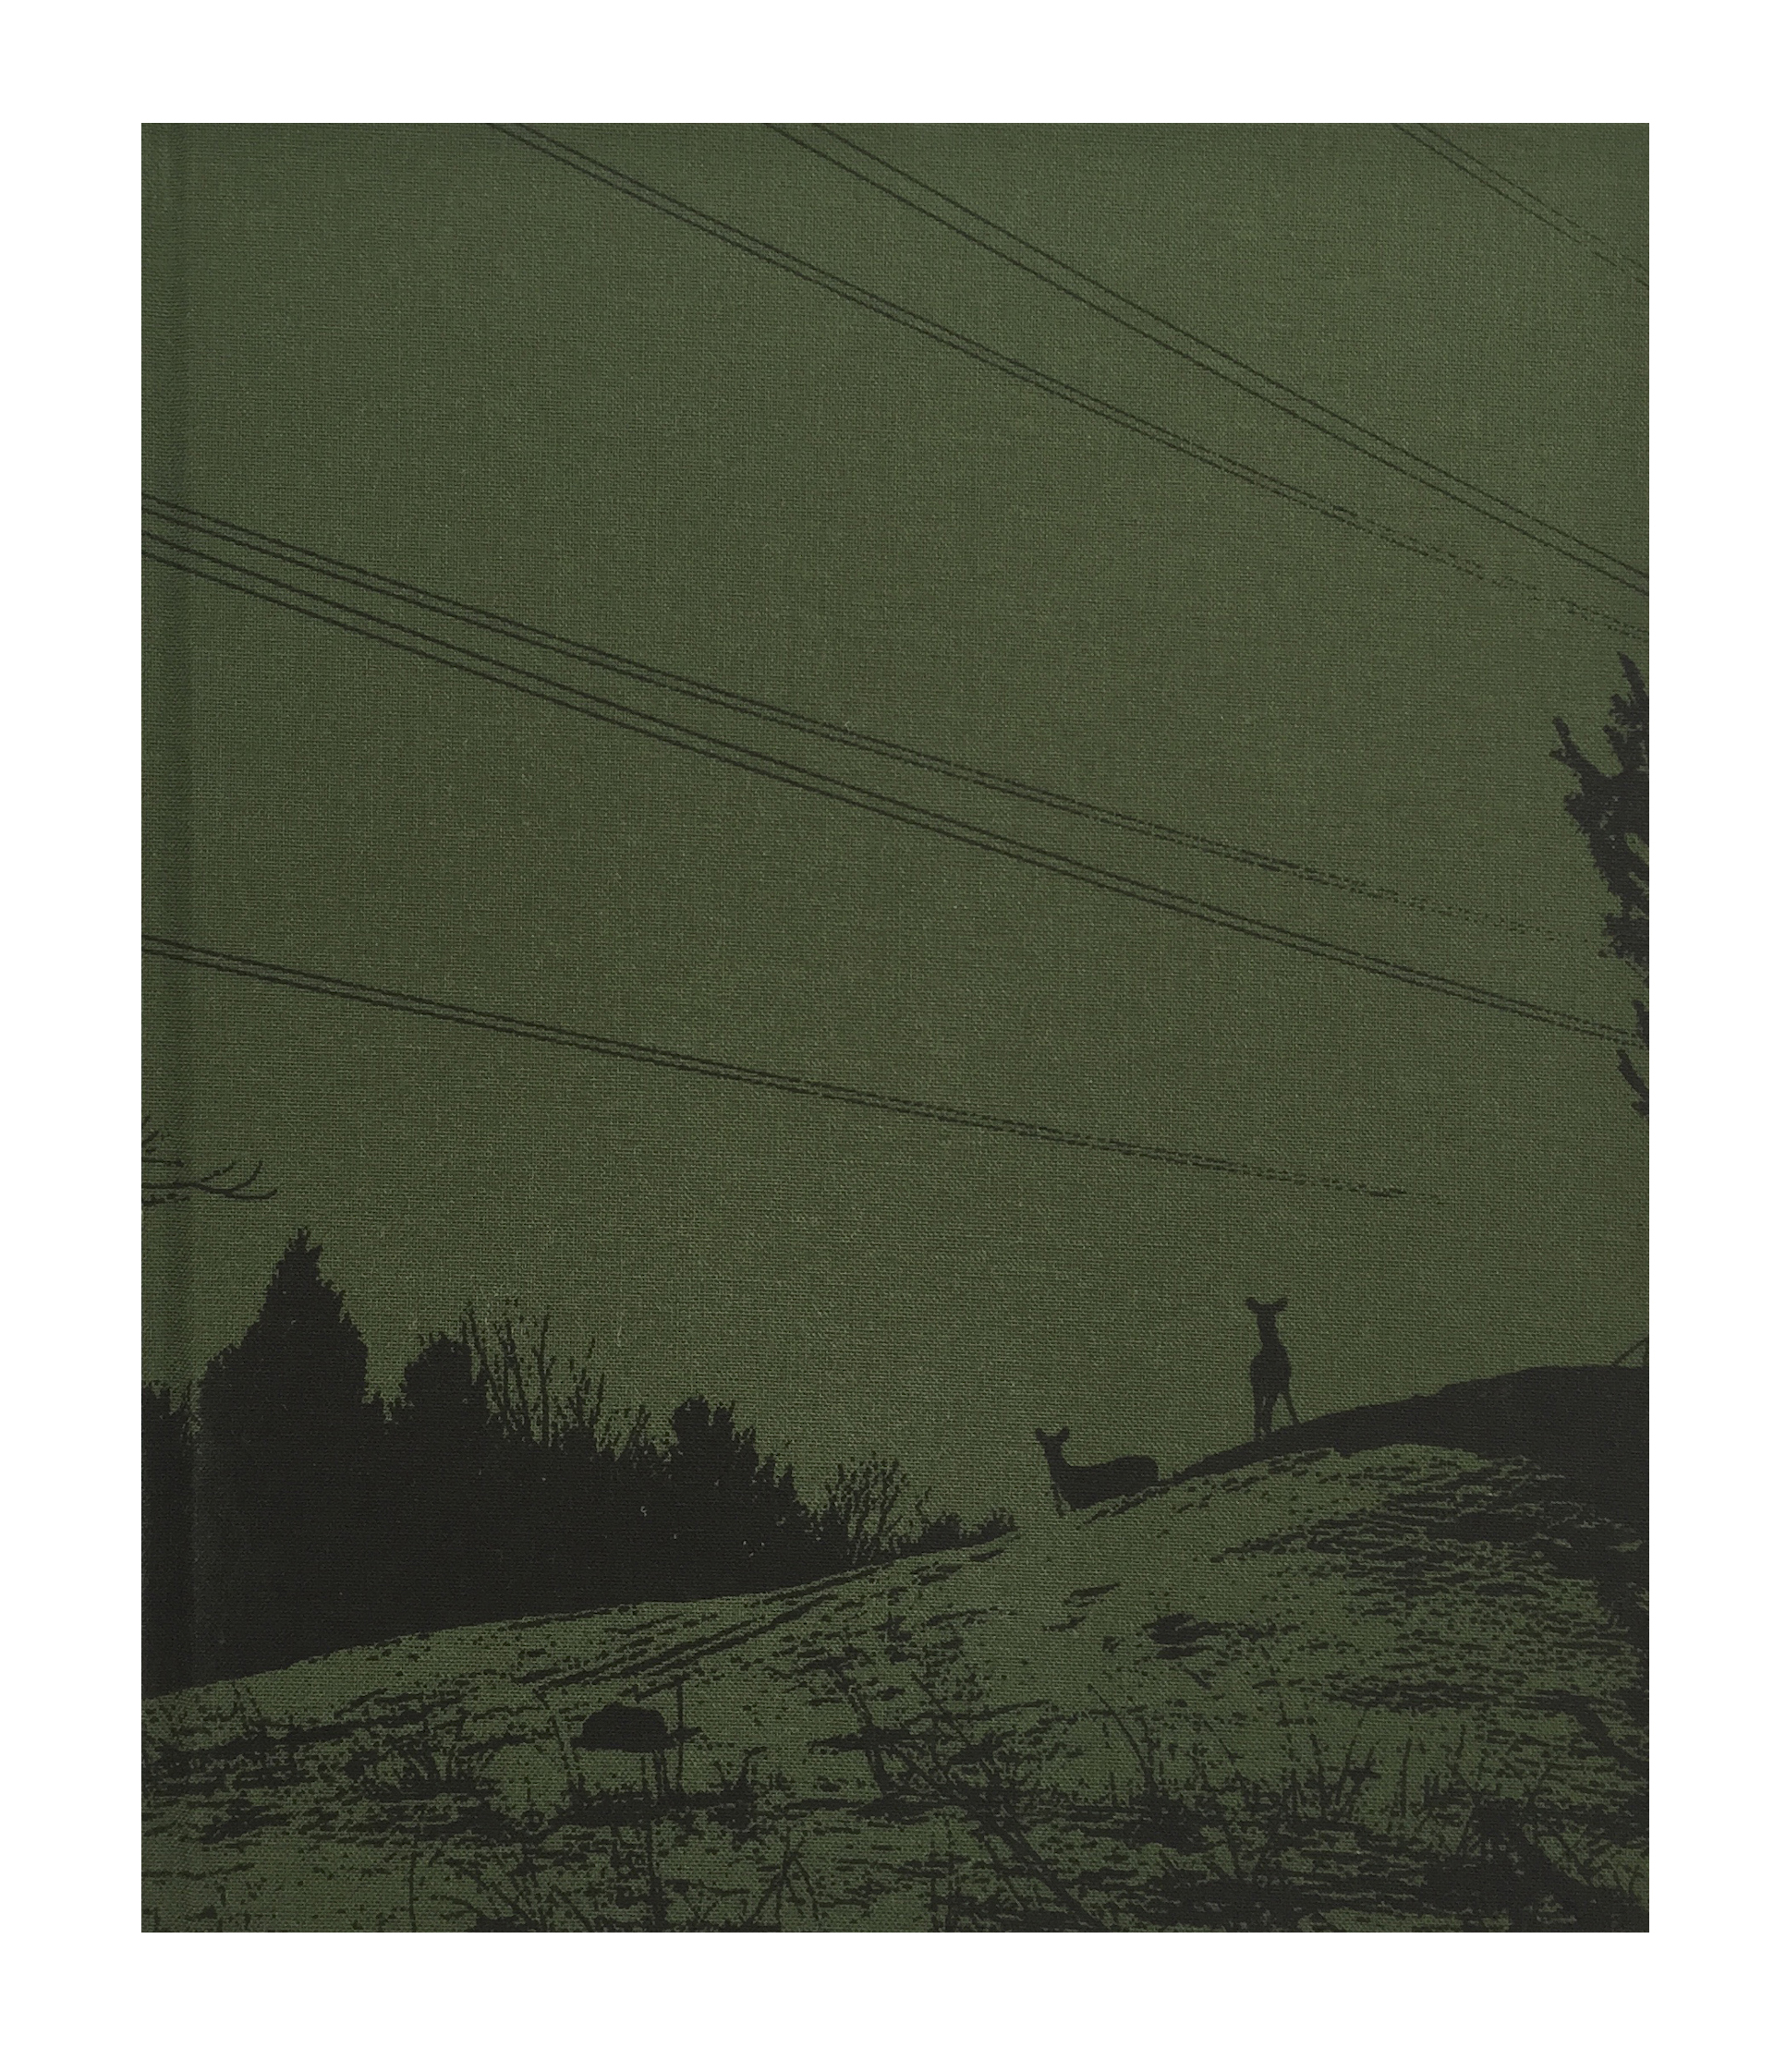 jo schryer photobooks photography phosmag landscape